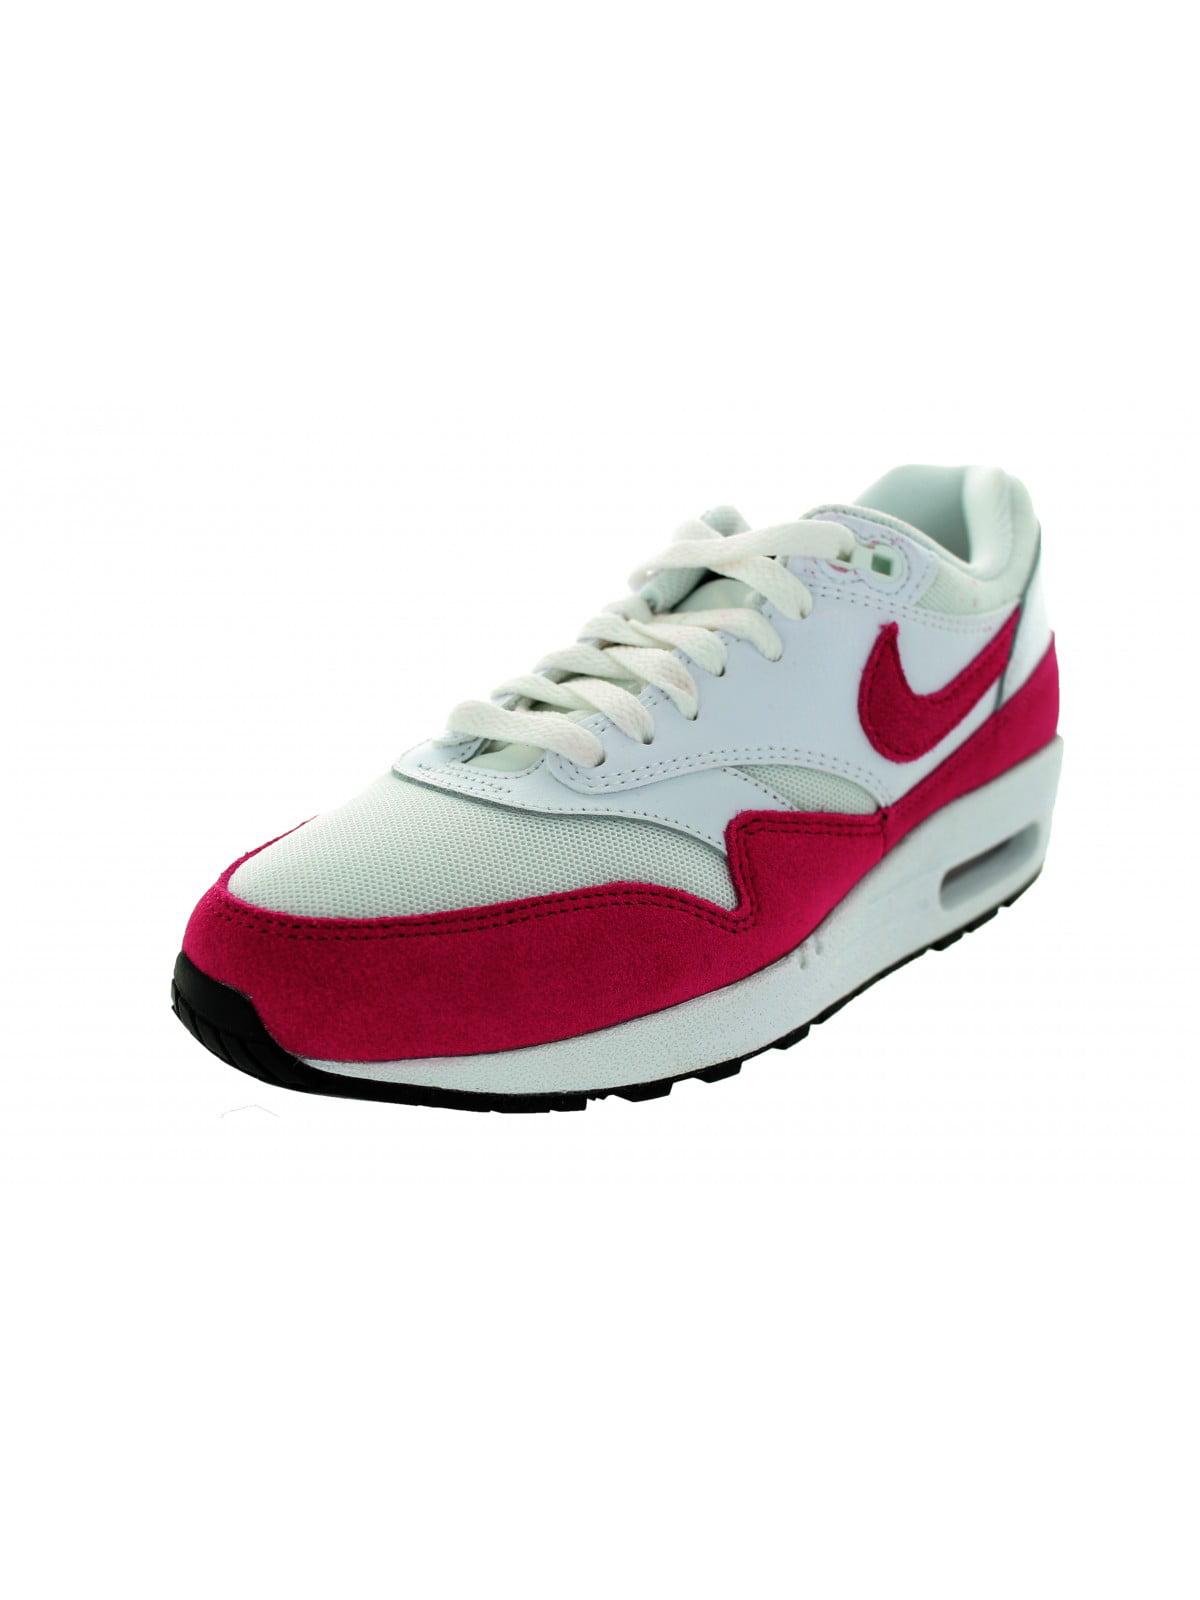 376908496d6 Nike Air Max for Less Mens KD VI ...